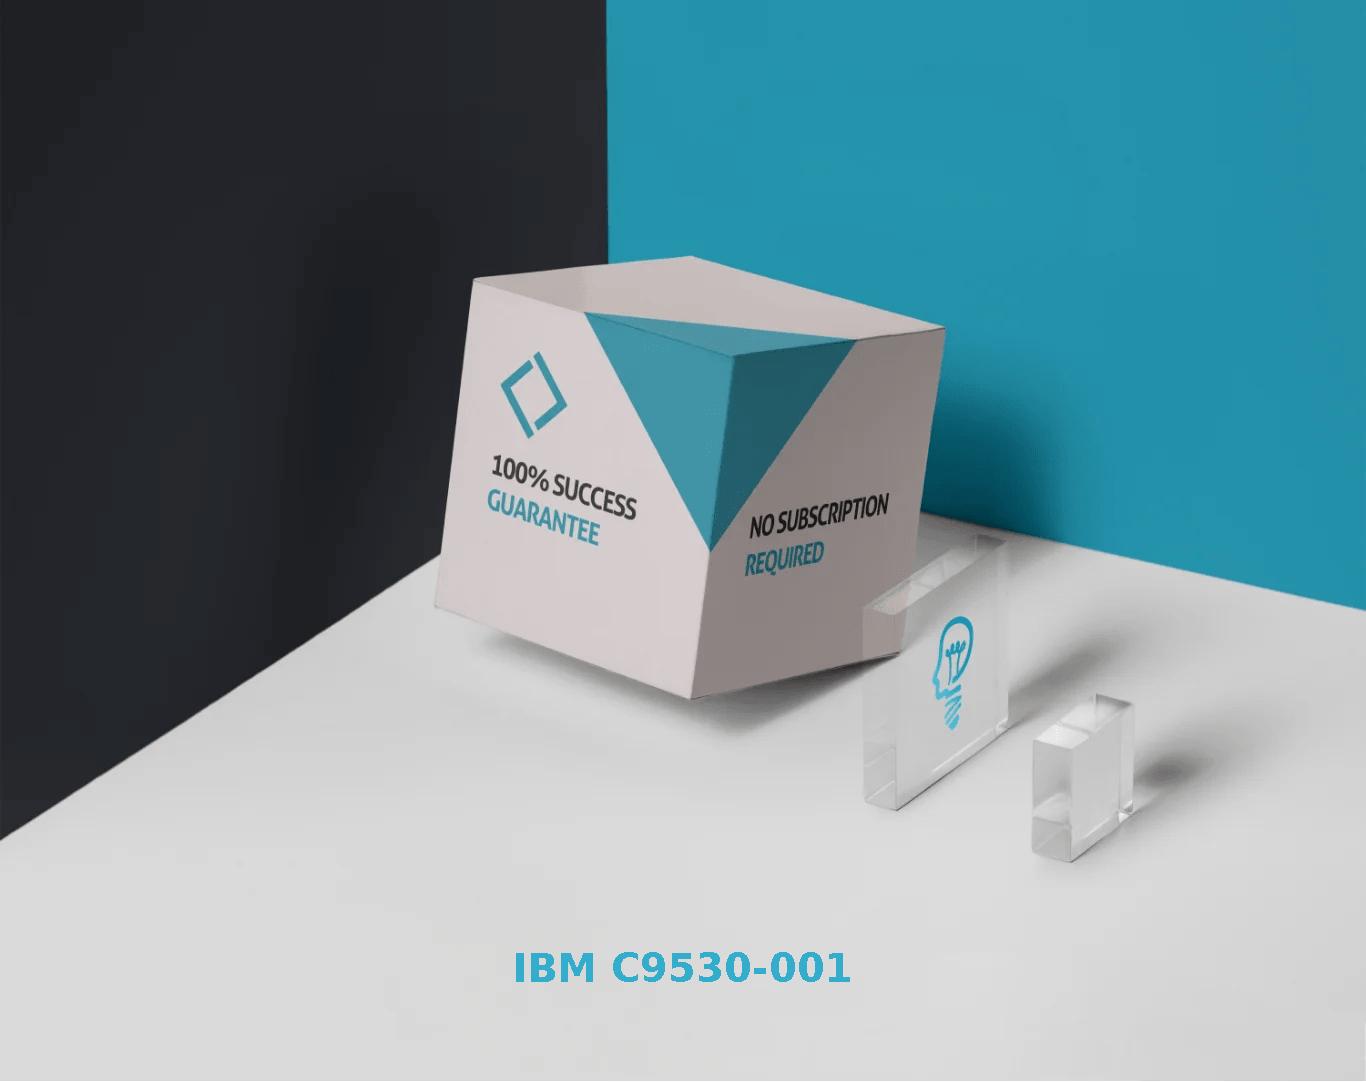 IBM C9530-001 Exams